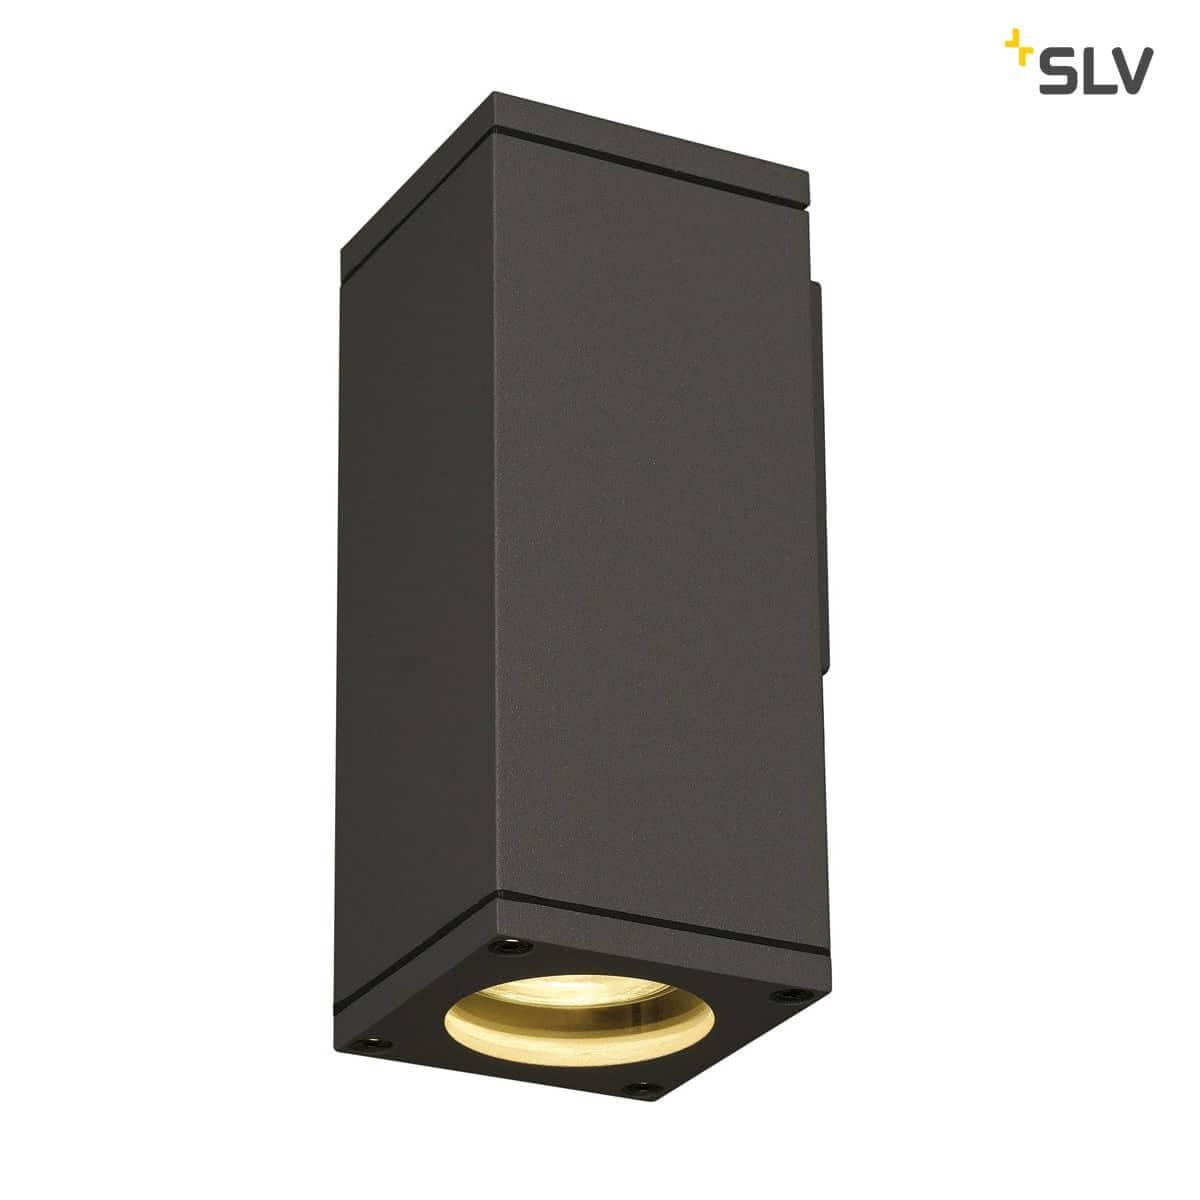 Philips Master  GU10 LED Spot 3.9W 280Lm Warmweiss dimmbar